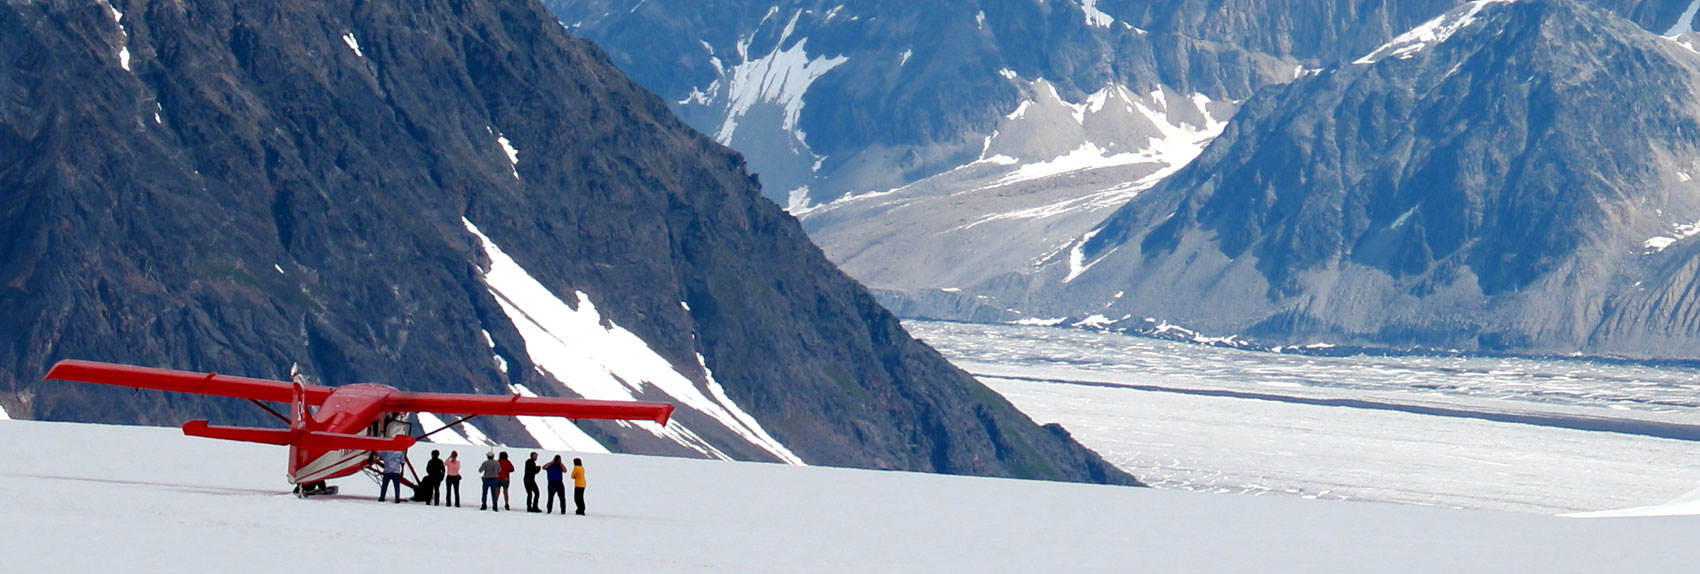 Alaska Tour Travel Vacations Hotels Tours Cruises Railroad Trips